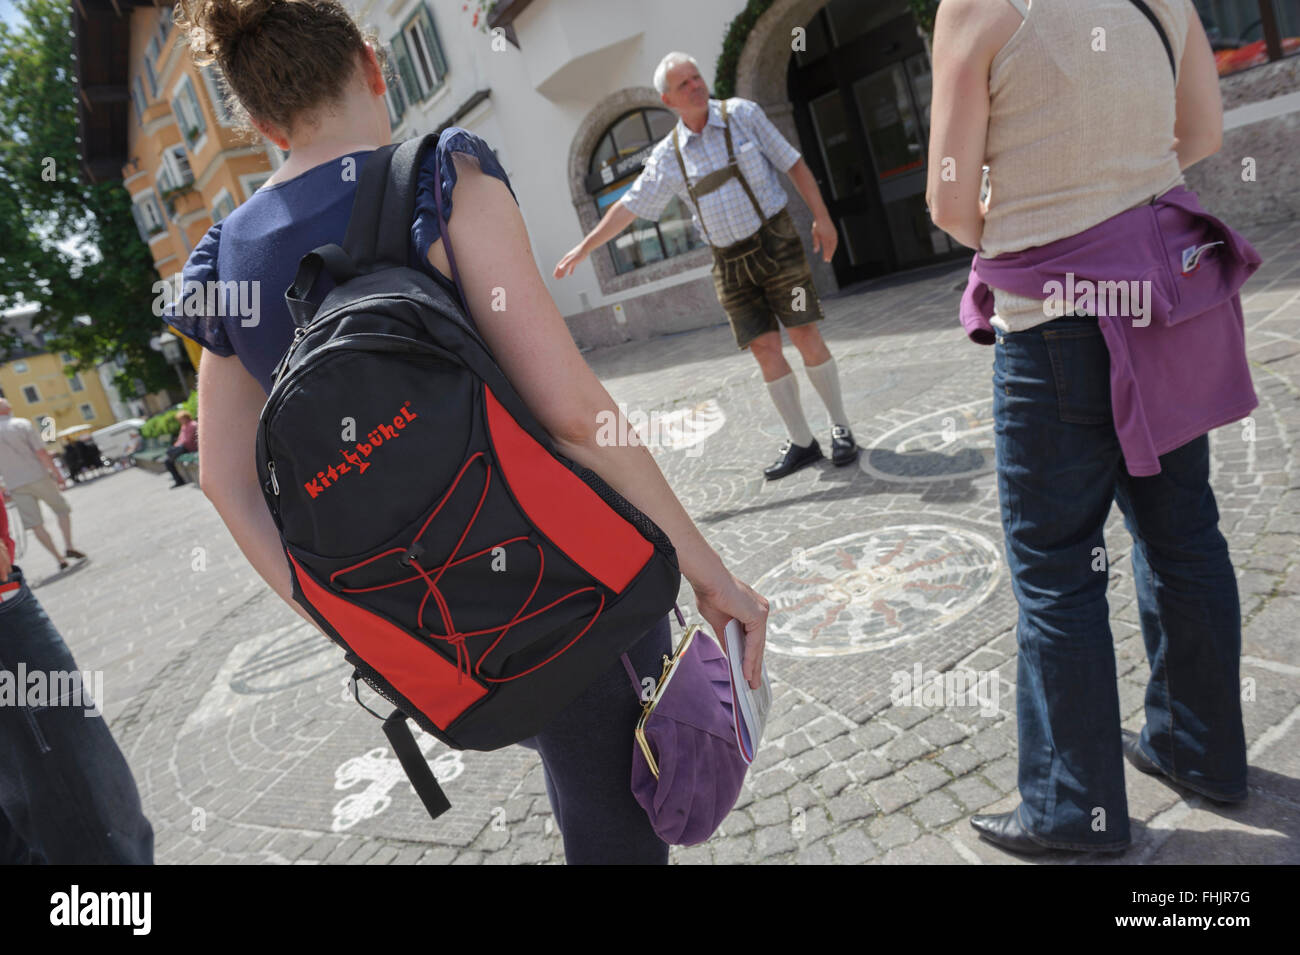 Tour guide in tradition Austrian Lederhosen leather shorts. Kitzbühel town center. Austria. Europe - Stock Image